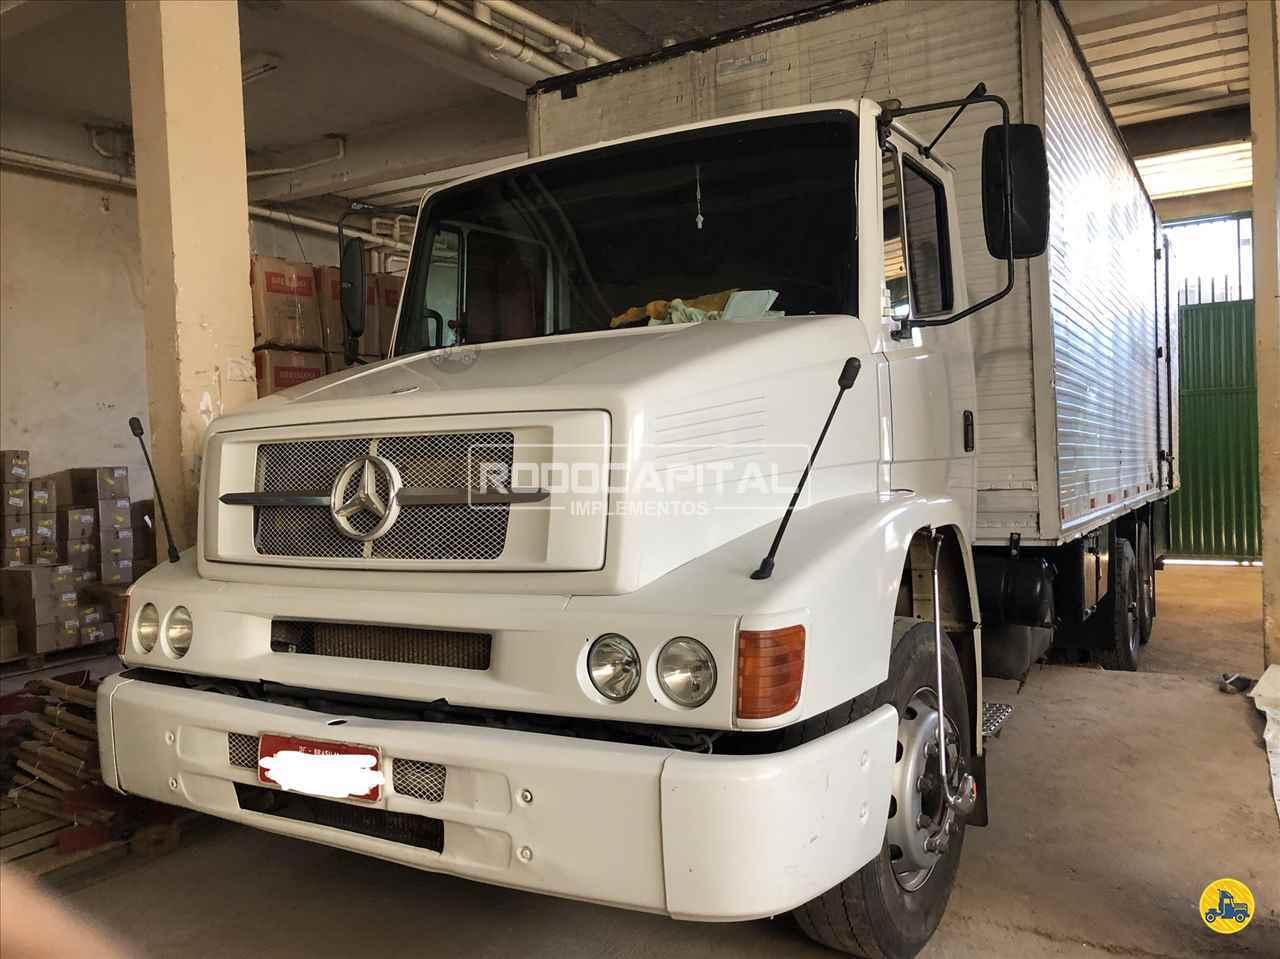 CAMINHAO MERCEDES-BENZ MB 1620 Baú Furgão Truck 6x2 RODOCAPITAL - TRUCKVAN BRASILIA DISTRITO FEDERAL DF